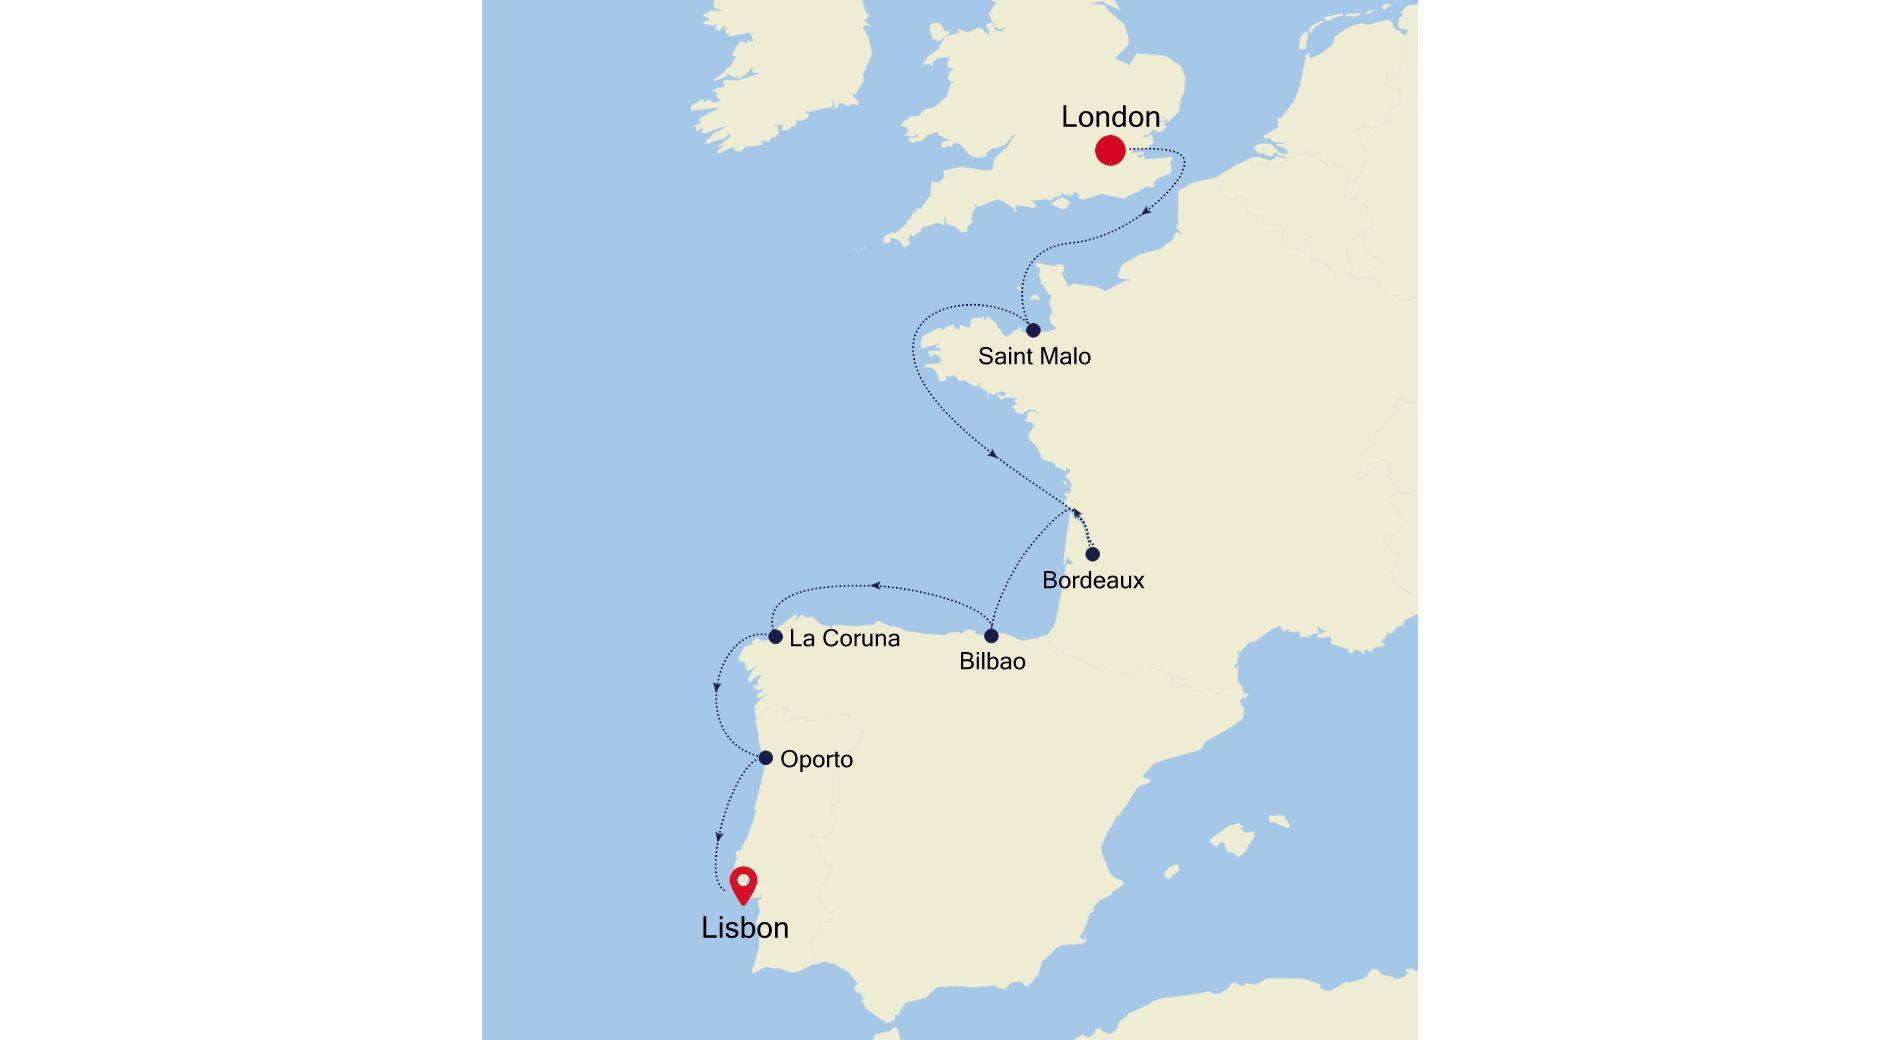 WH200718009 - London nach Lisbon